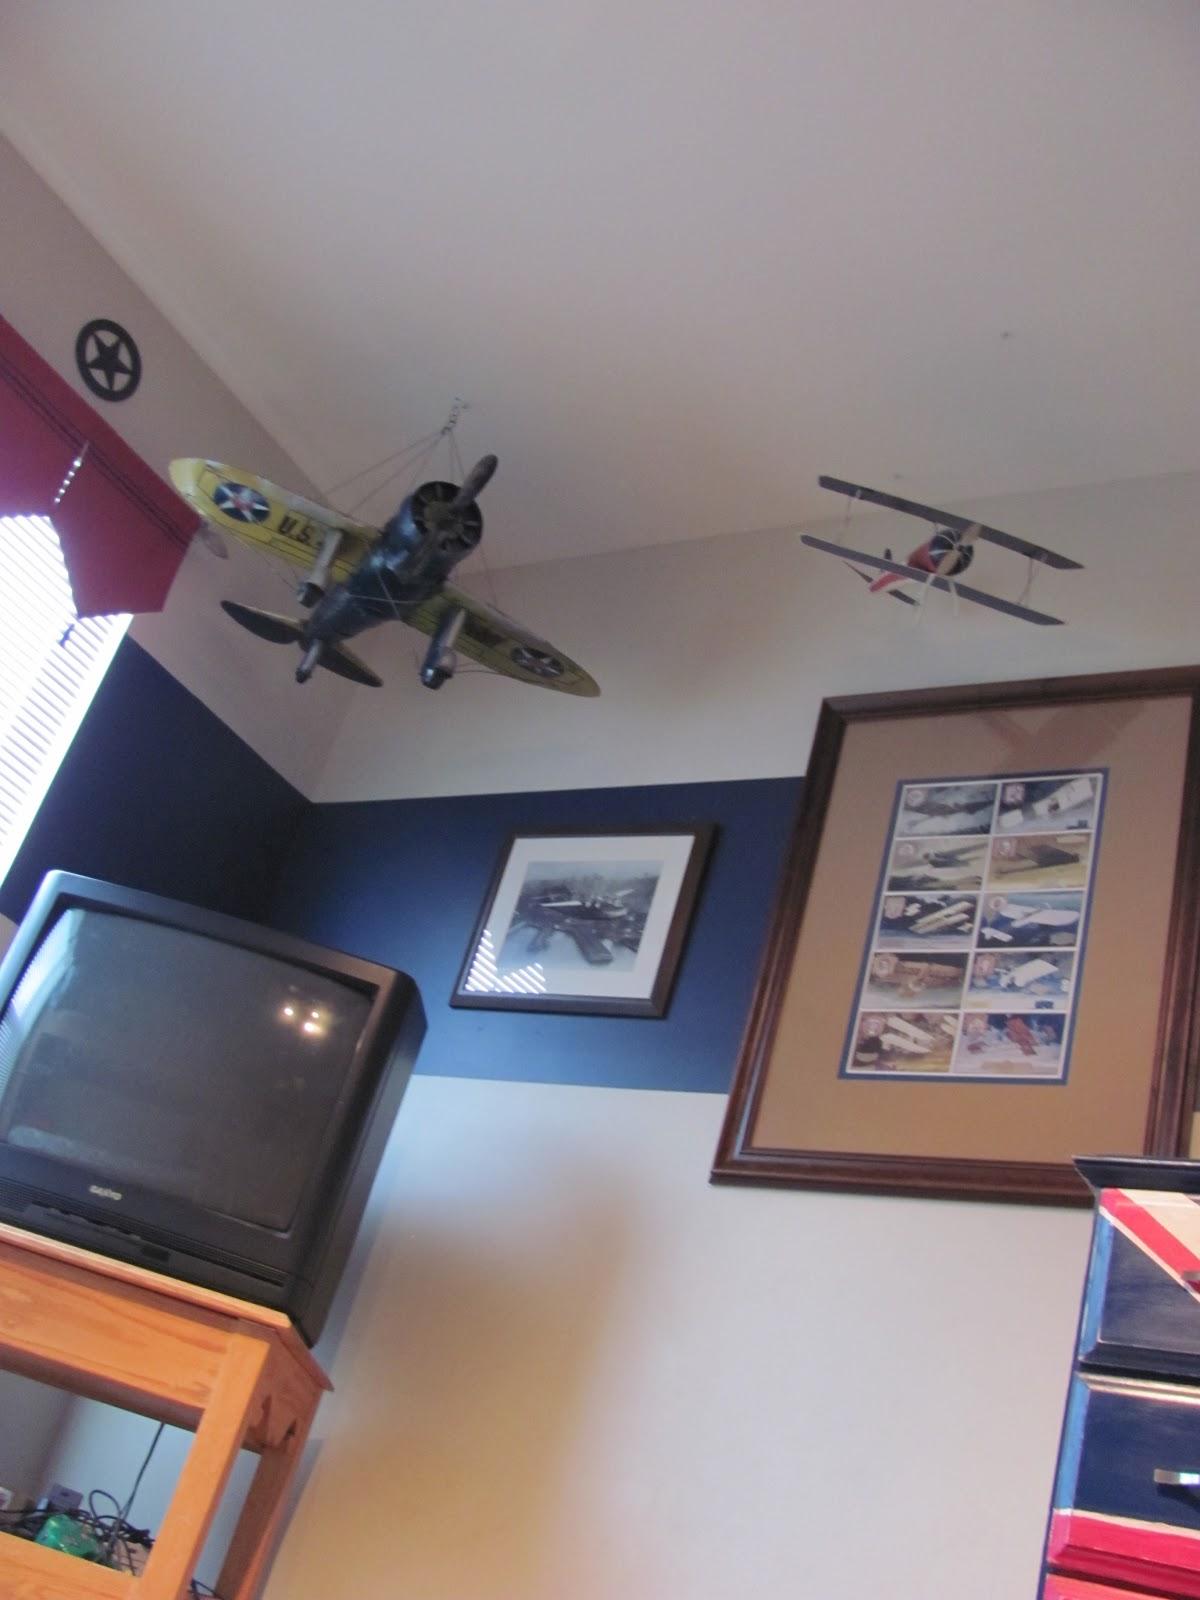 Airplane Bedroom Decor: Header: Boys Airplane Bedroom